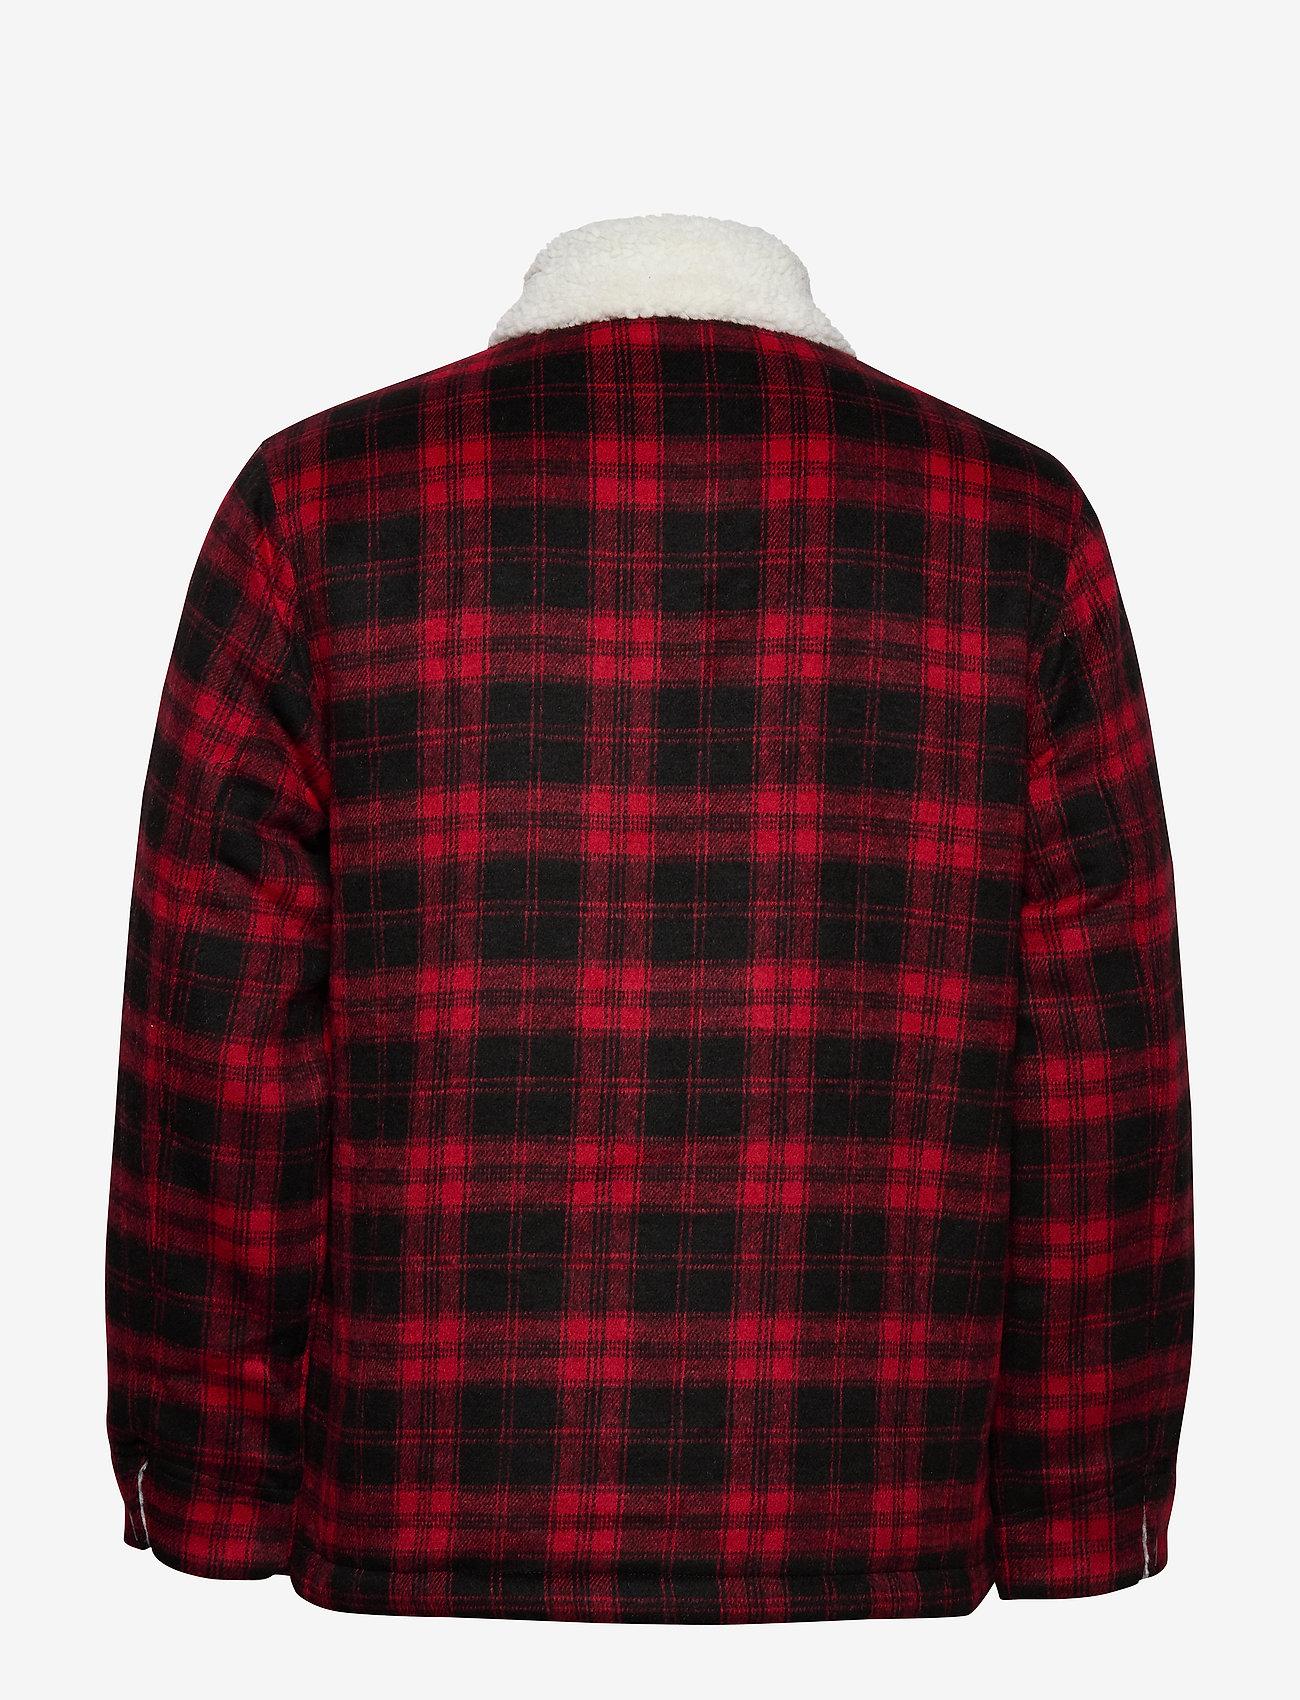 Lee Jeans - WOOL LOCO SHERPA - wool jackets - warp red - 1